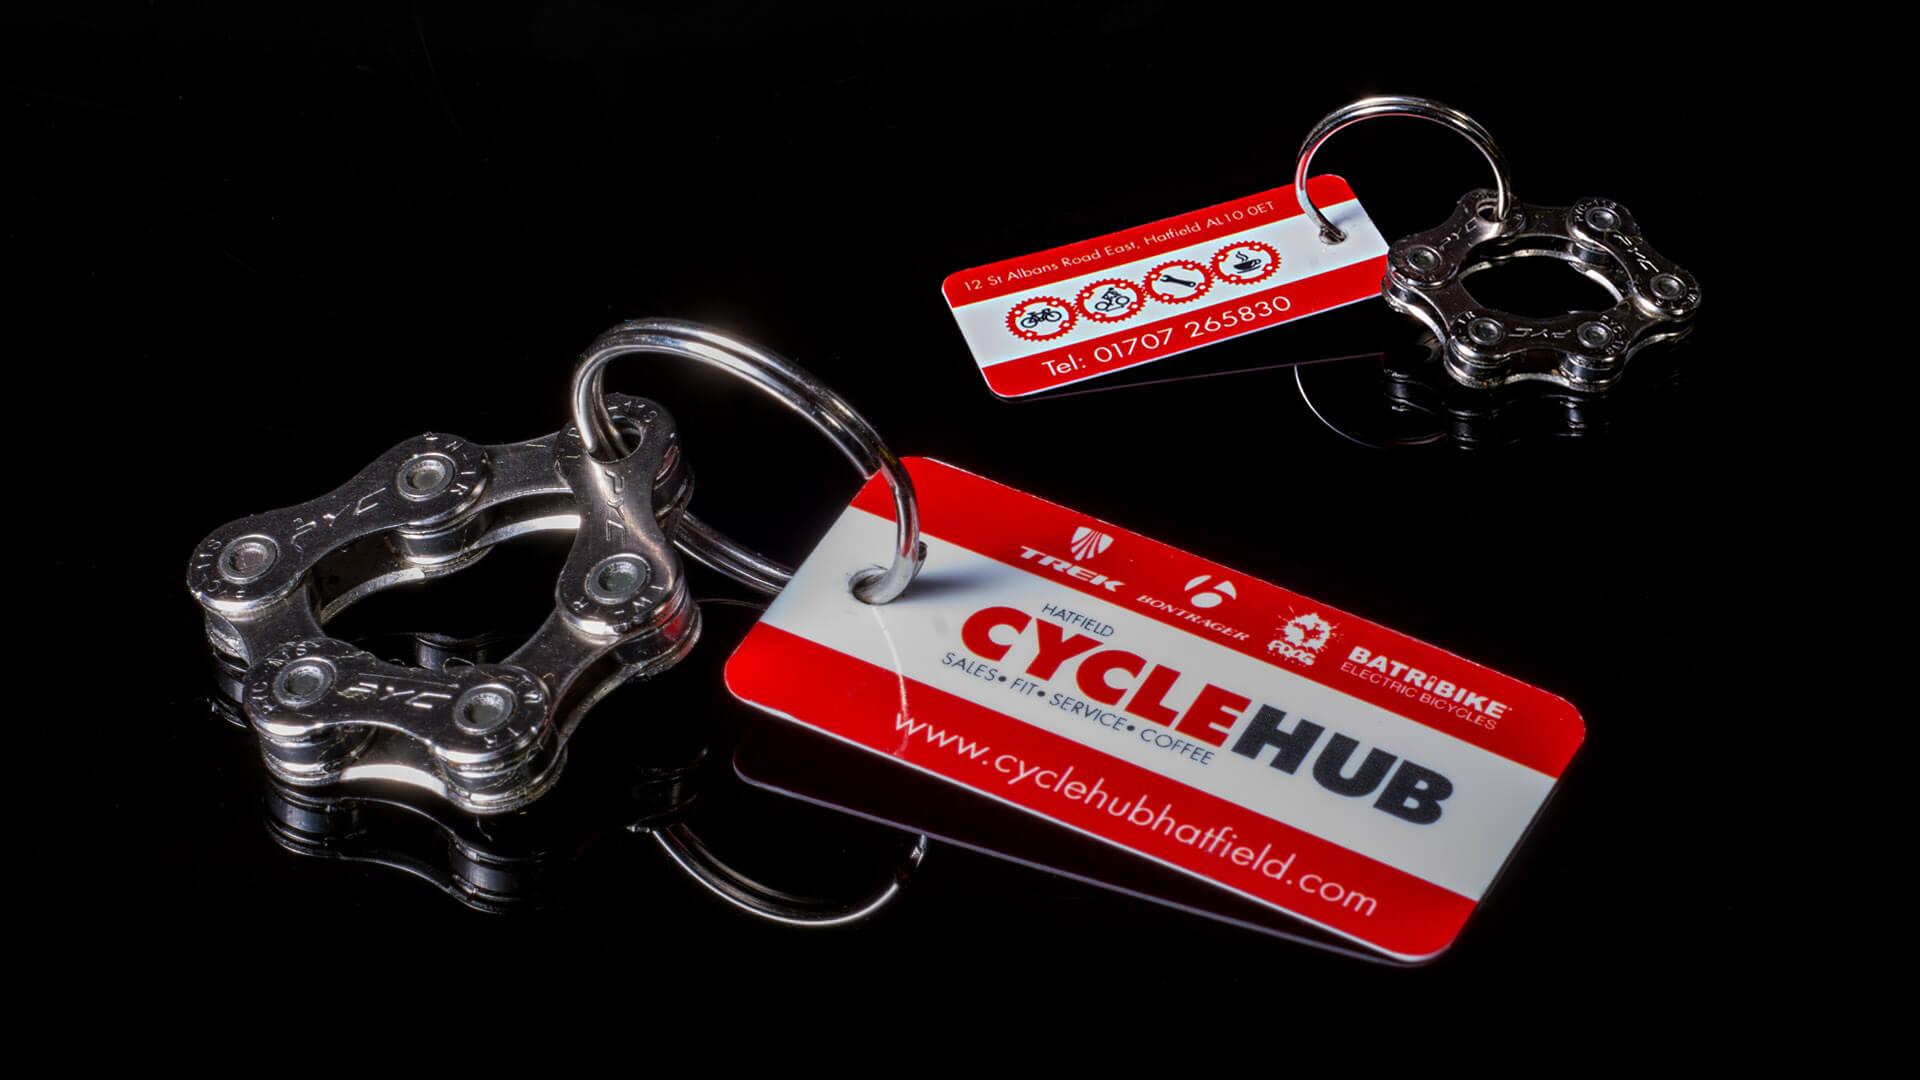 Hatfield Cycle hub key fob